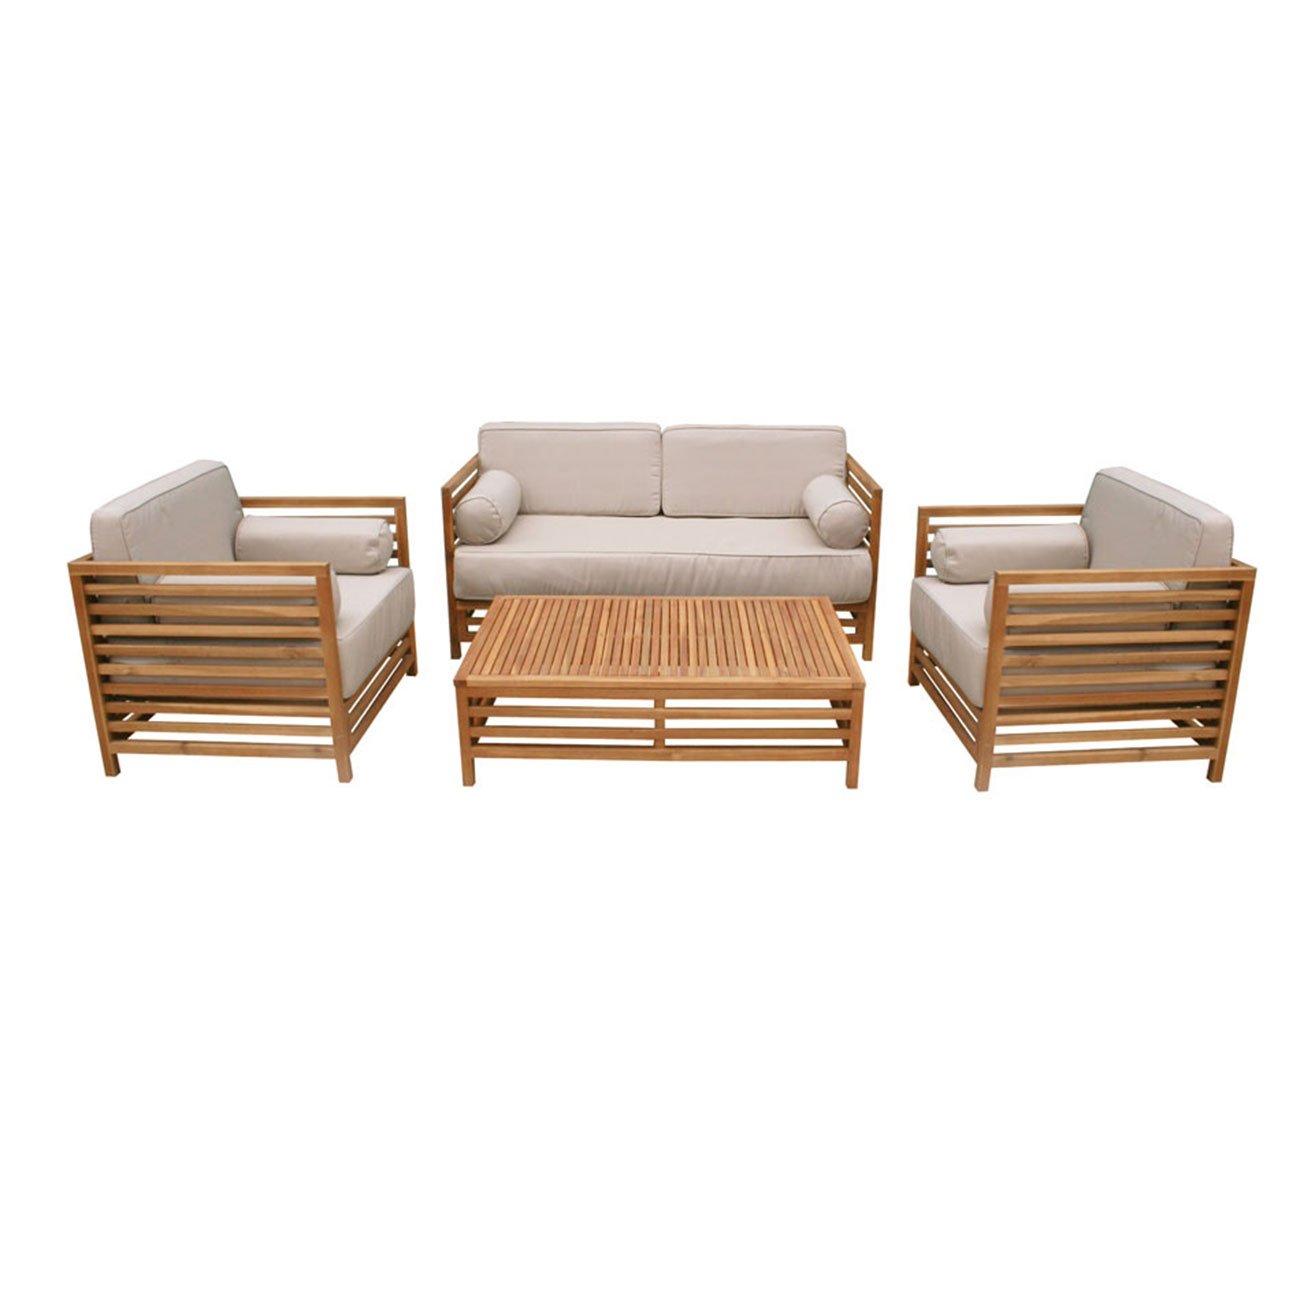 Gartenlounge OUTLIV. Belray Loungeset 4-tlg. Akazie Teaklook / Kissen ecru 712801-855803